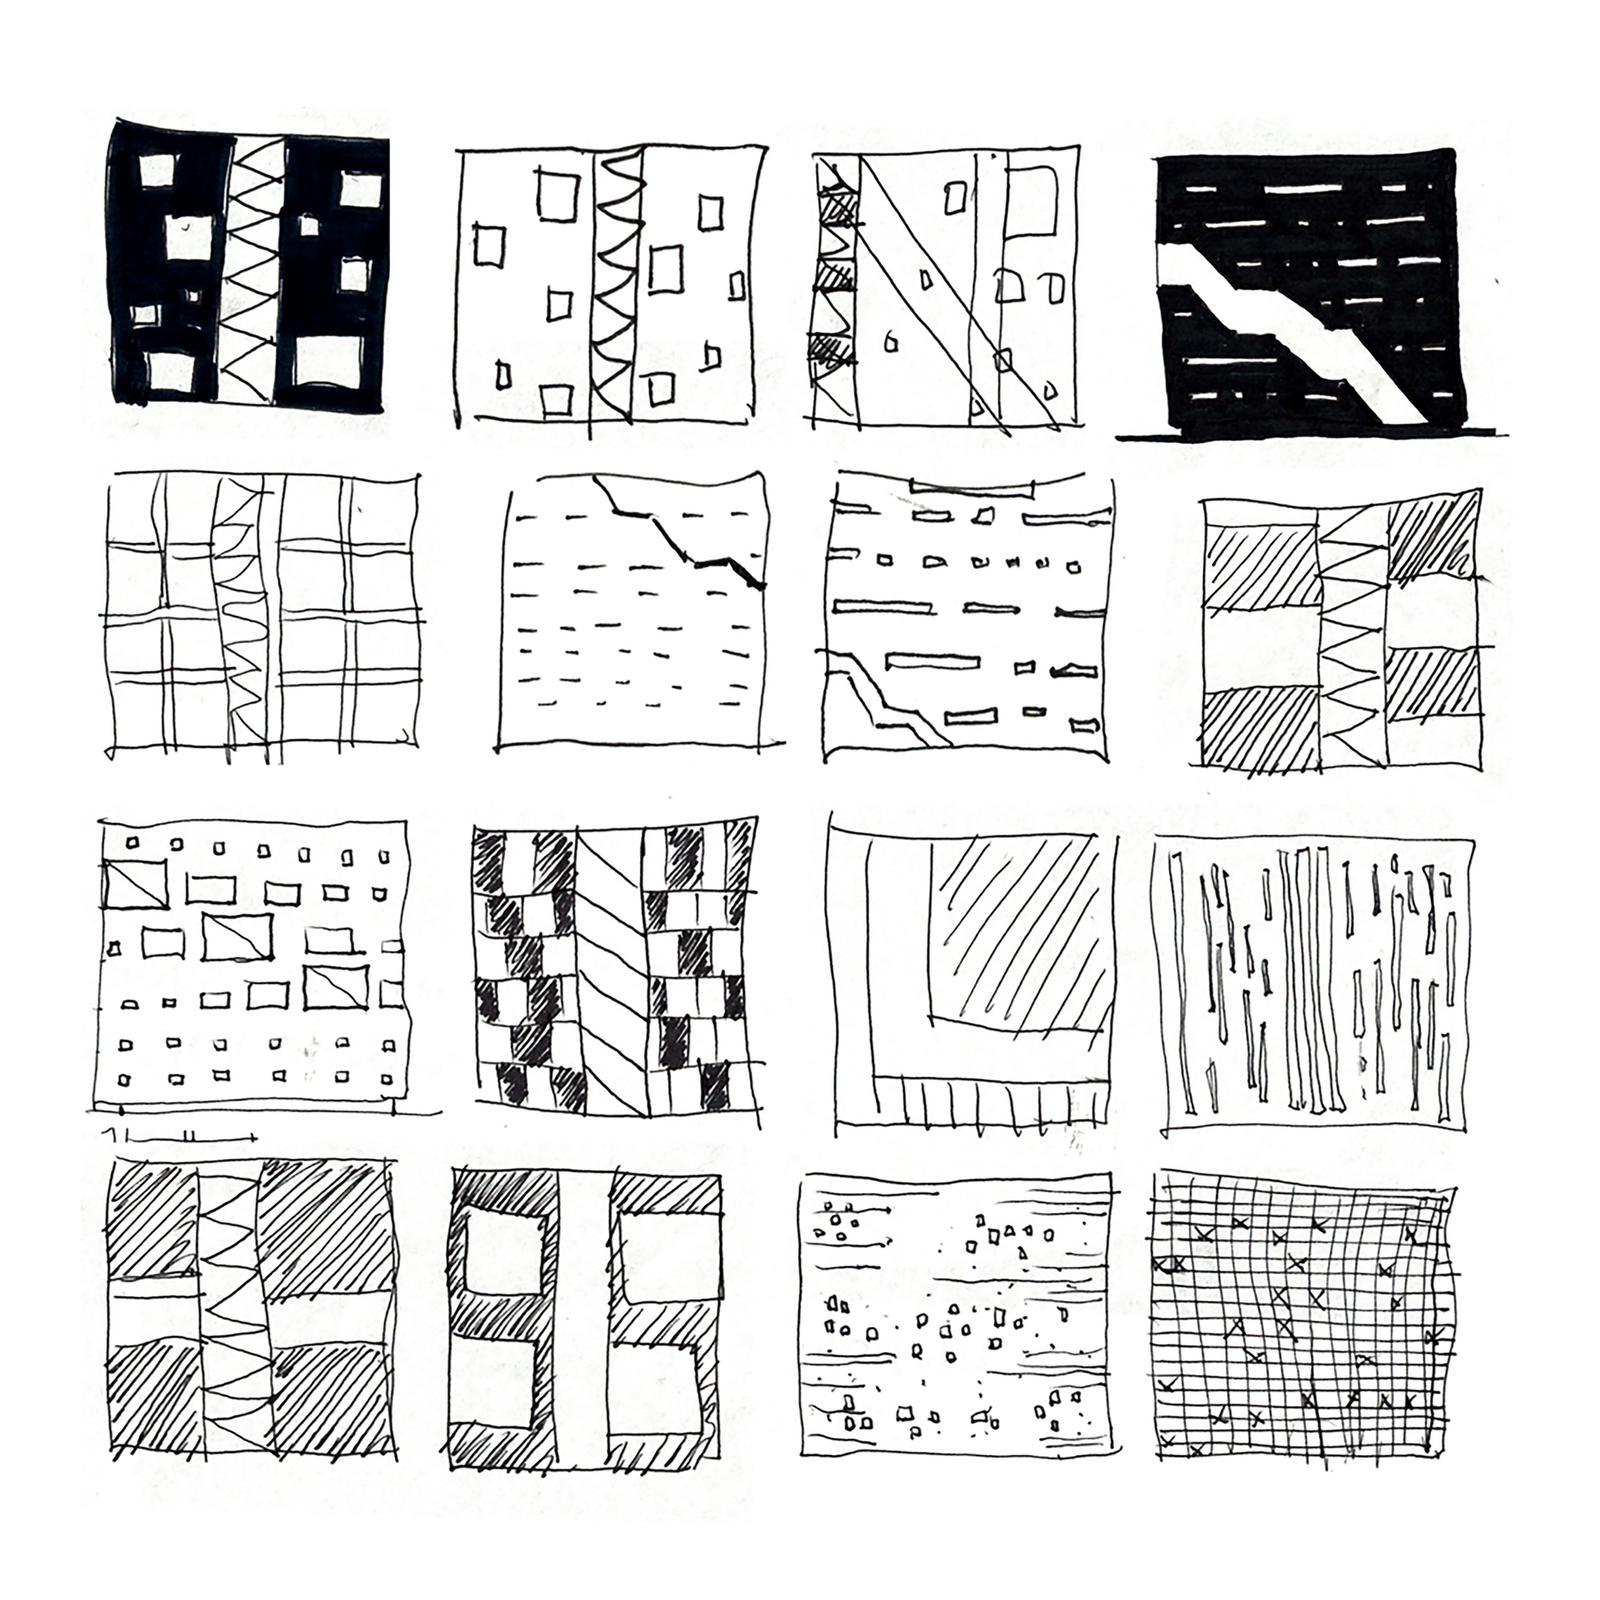 Jang Ock Kim design sketches